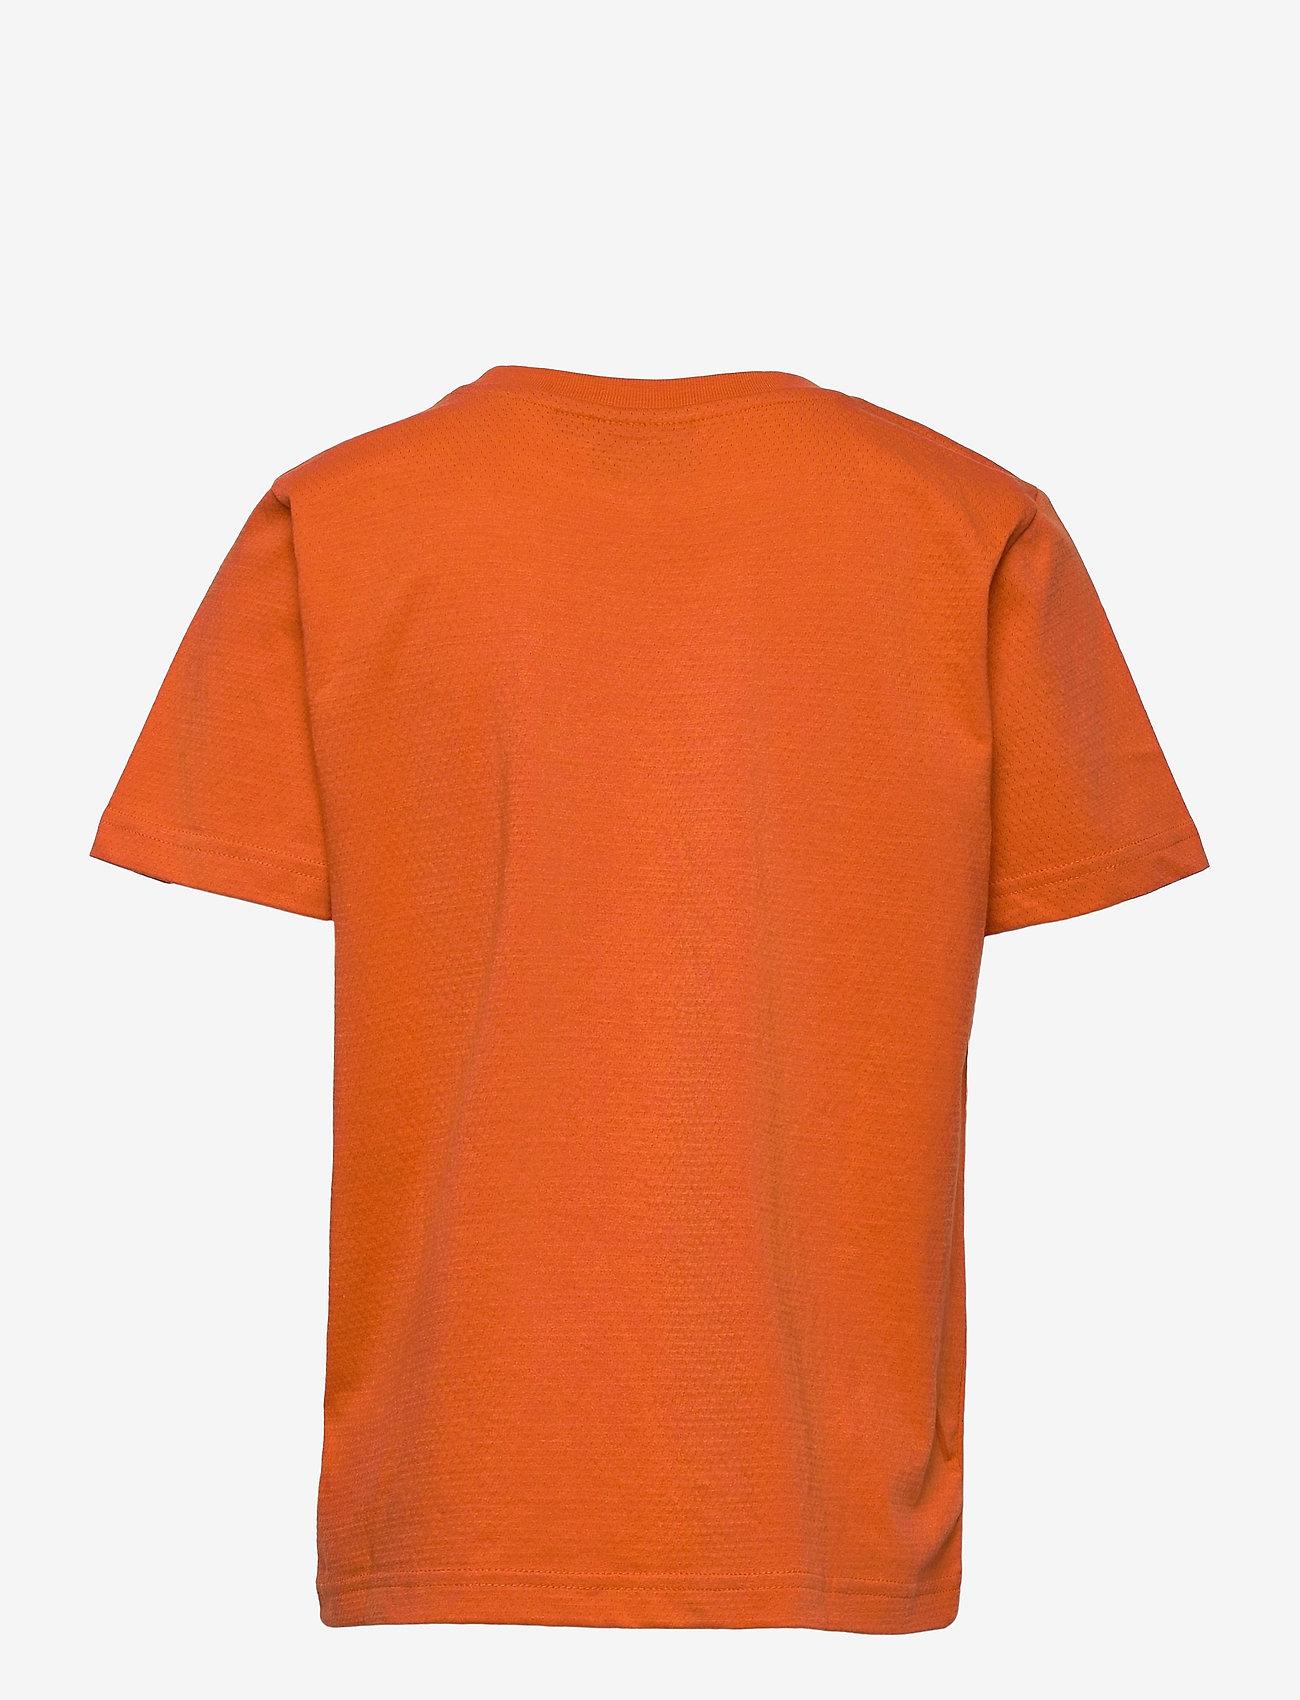 Hummel - hmlTUPAC T-SHIRT L/S - short-sleeved - koi - 1